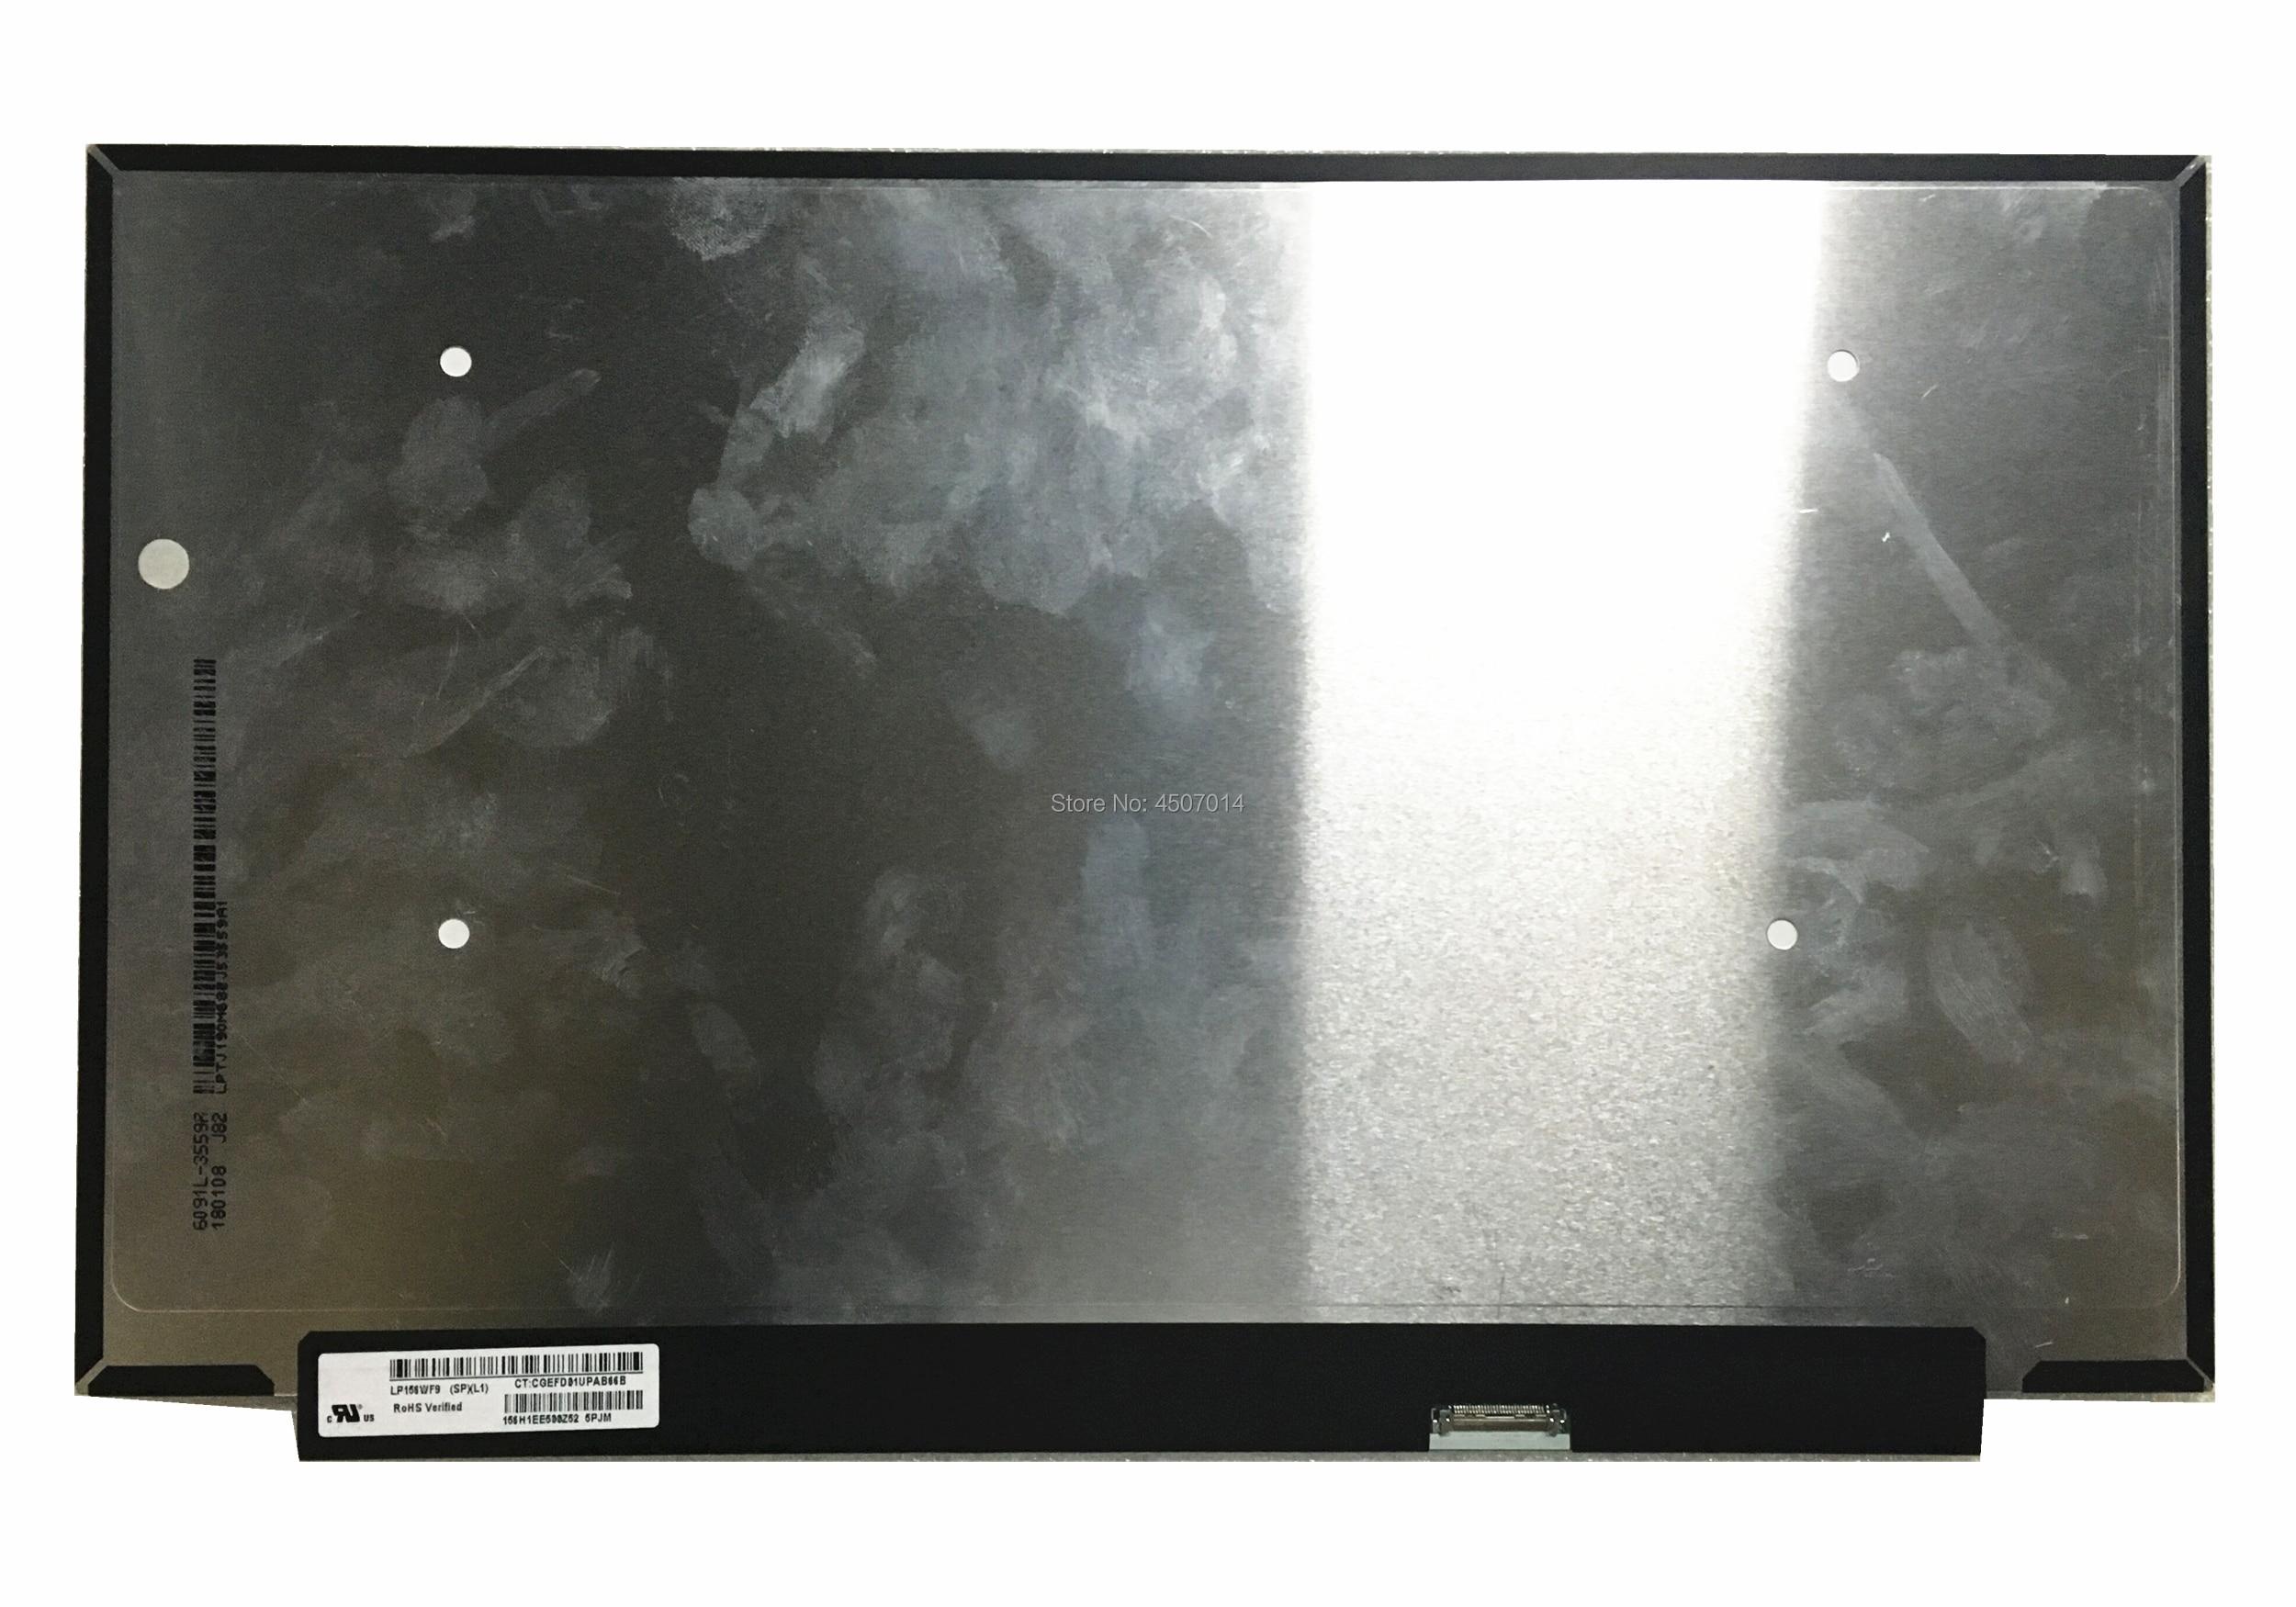 Free Shipping LP156WF9-SPL1 LP156WF9 SPL1 15.6inch Laptop Lcd Screen 1920*1080 EDP 30 Pins Lcd Screen Display ReplacementFree Shipping LP156WF9-SPL1 LP156WF9 SPL1 15.6inch Laptop Lcd Screen 1920*1080 EDP 30 Pins Lcd Screen Display Replacement